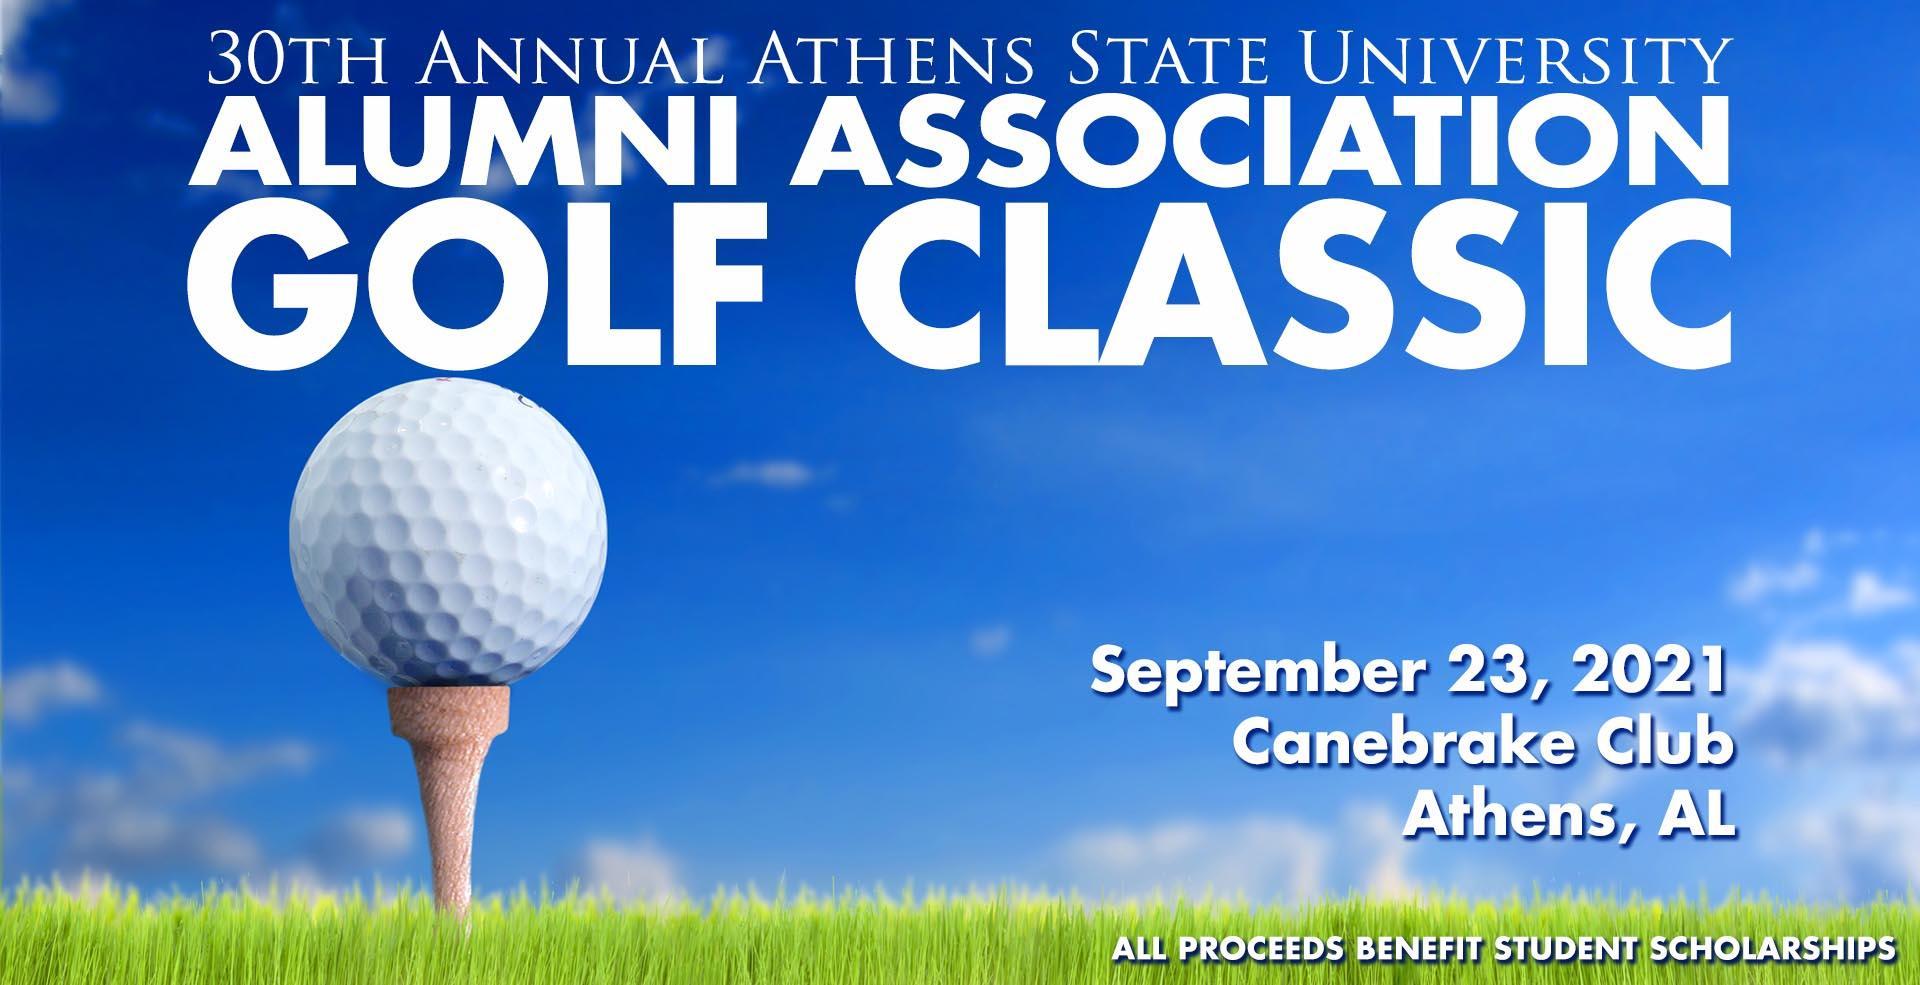 2021 Alumni Association Golf Classic